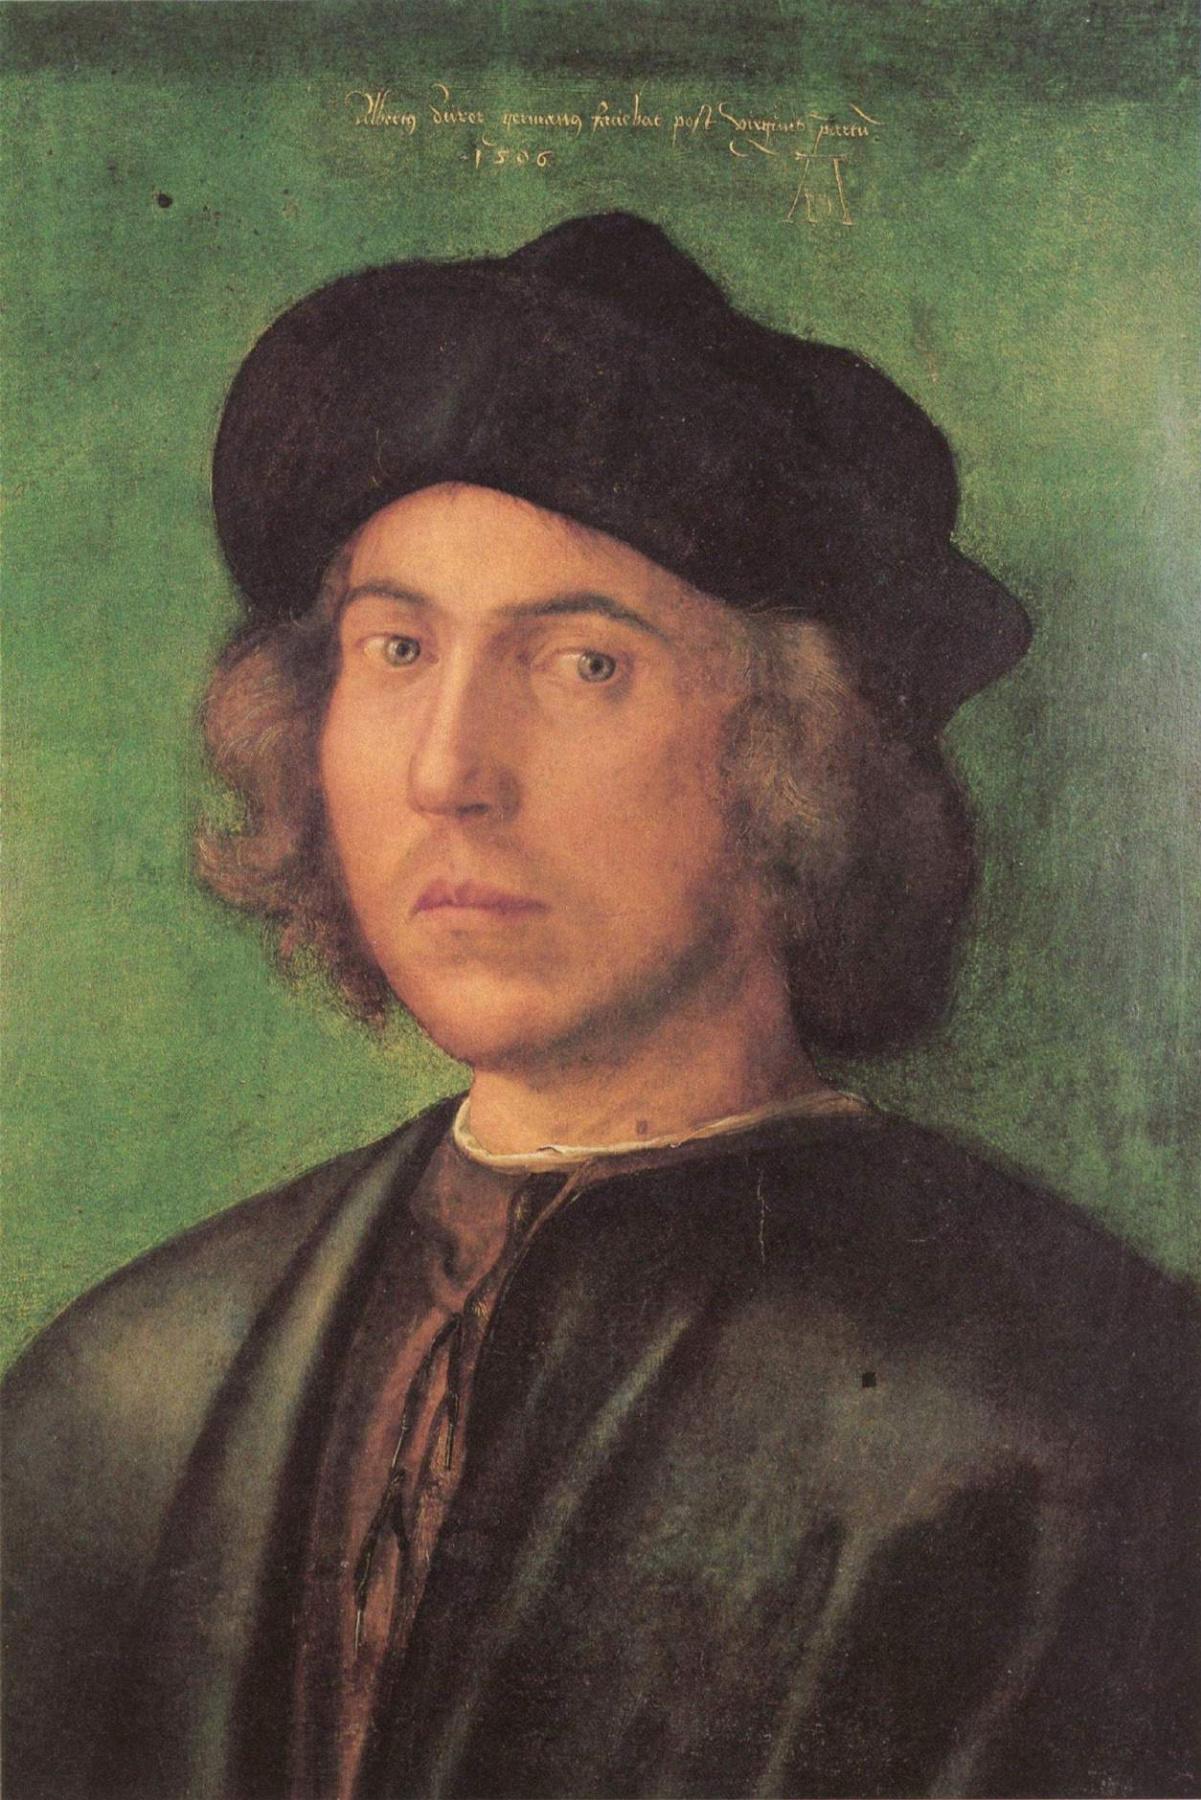 Albrecht Durer. Portrait of young man on green background